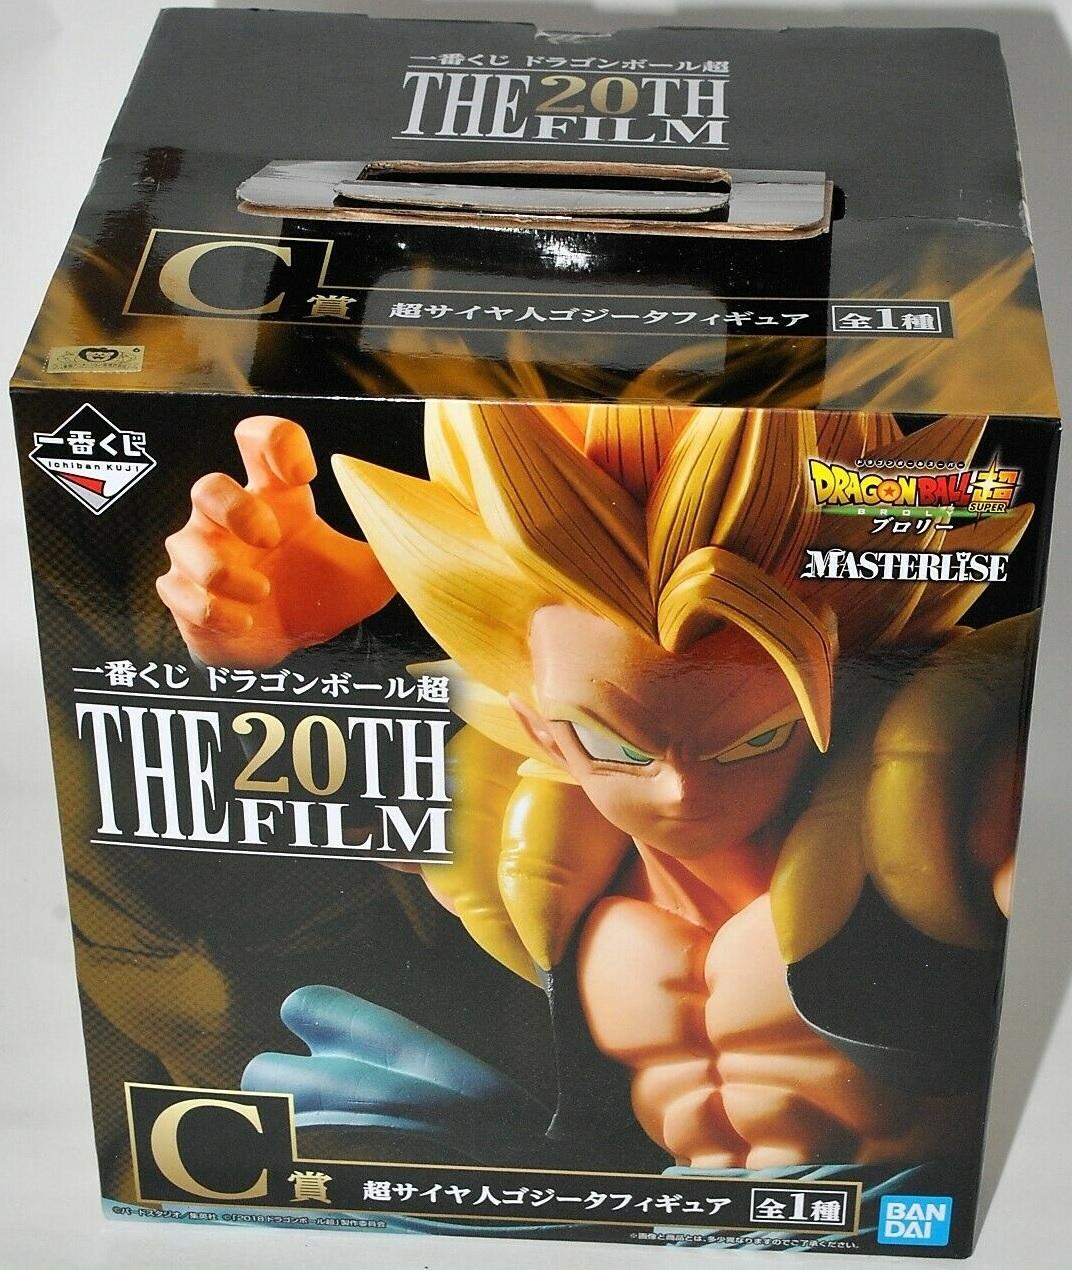 Super Saiyan Gogeta Figure, Ichiban Kuji Prize C,  Dragon Ball, The 20th Film, Masterlise, Bandai